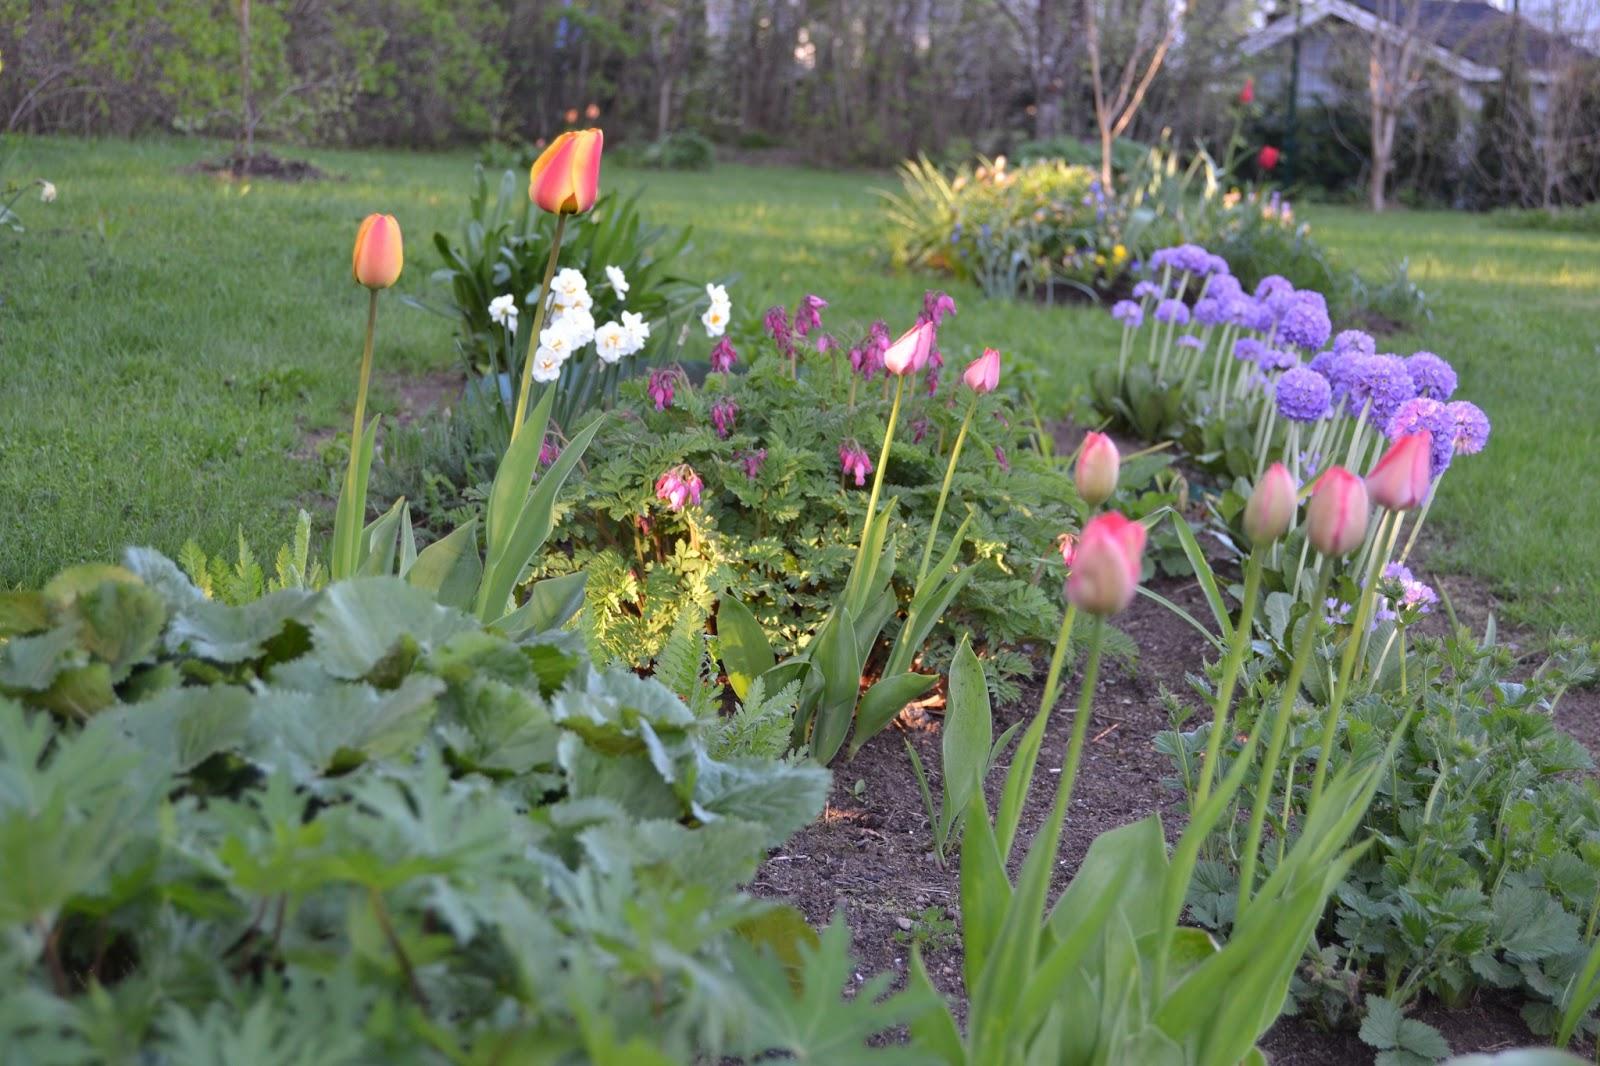 Ihana kevät! – Wonderful spring!